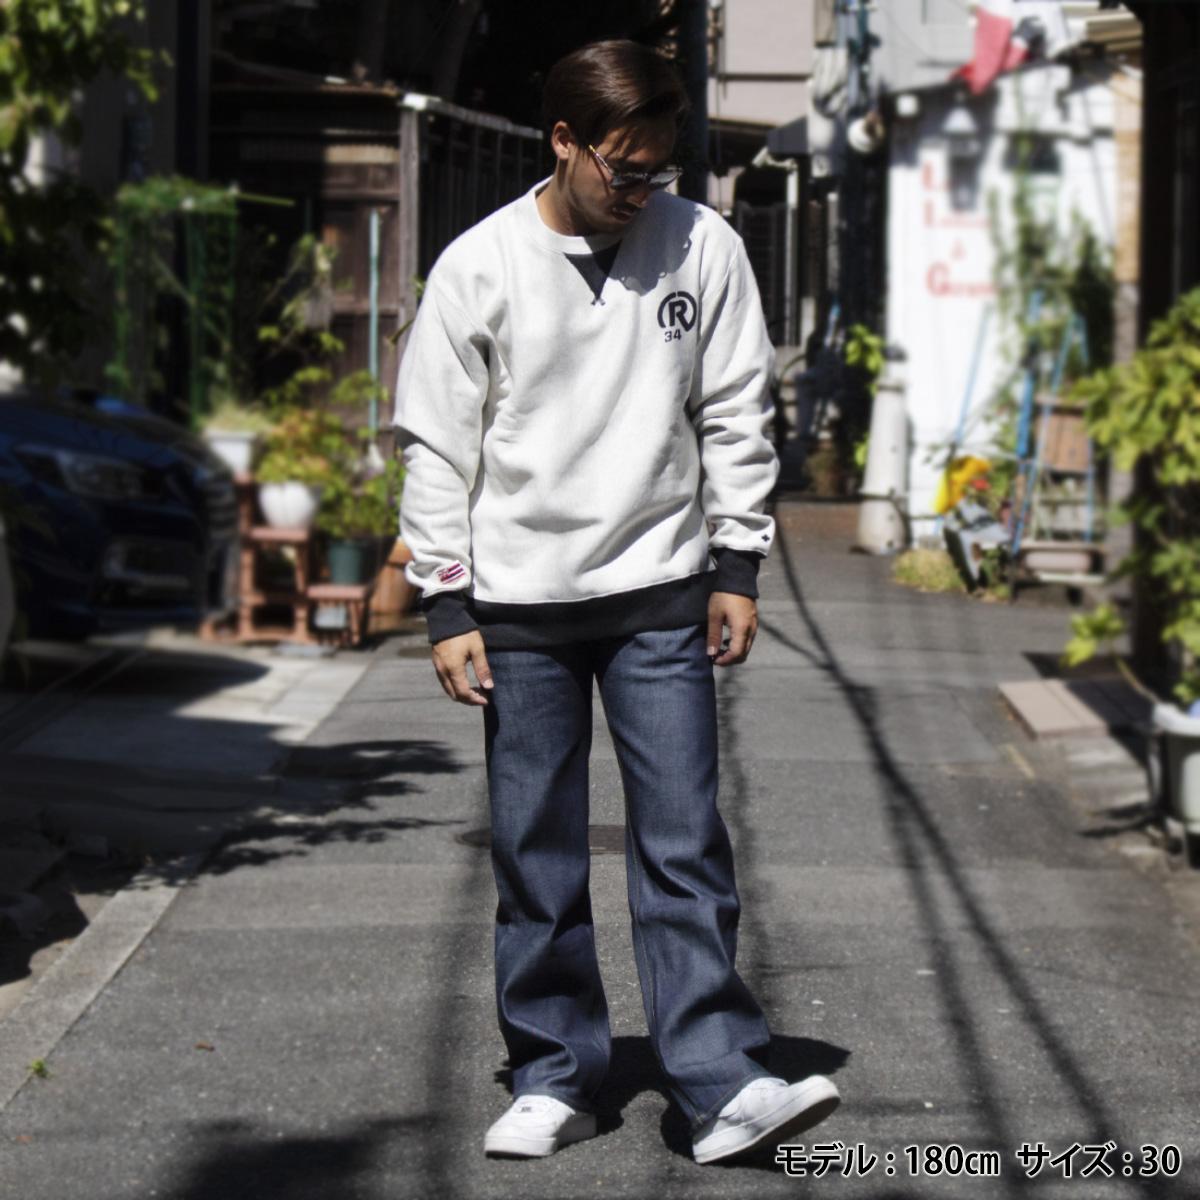 20TH ANNIVERSARY R MARK MADE IN JAPAN DENIM